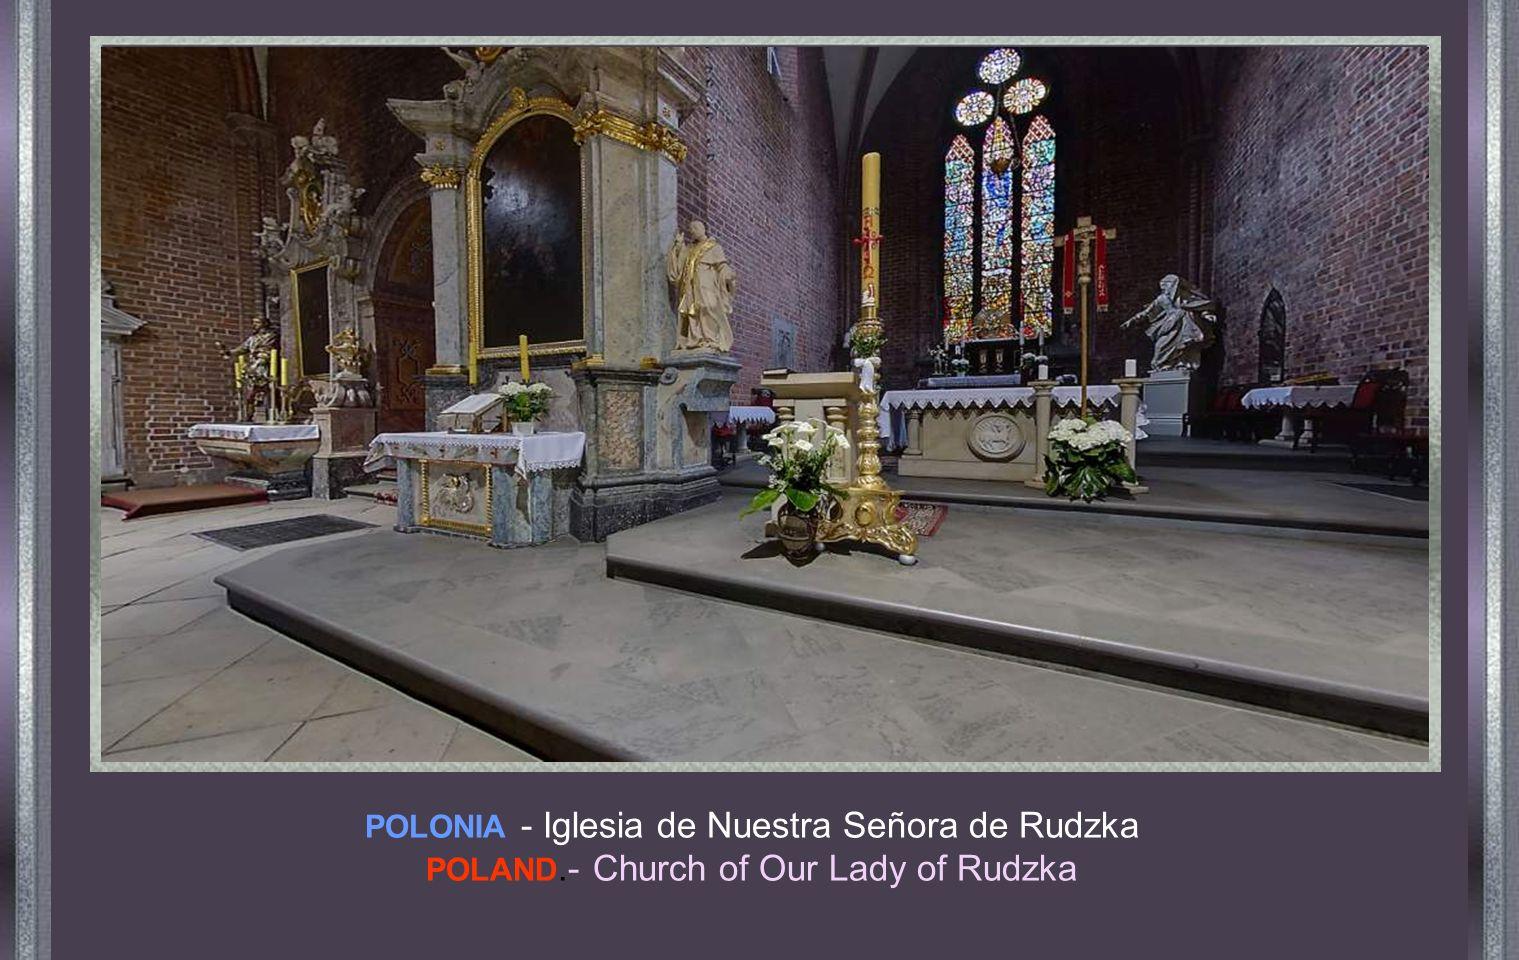 POLONIA.- Iglesia parroquial de Santa Teresa POLAND - Parish Church of Saint Teresa